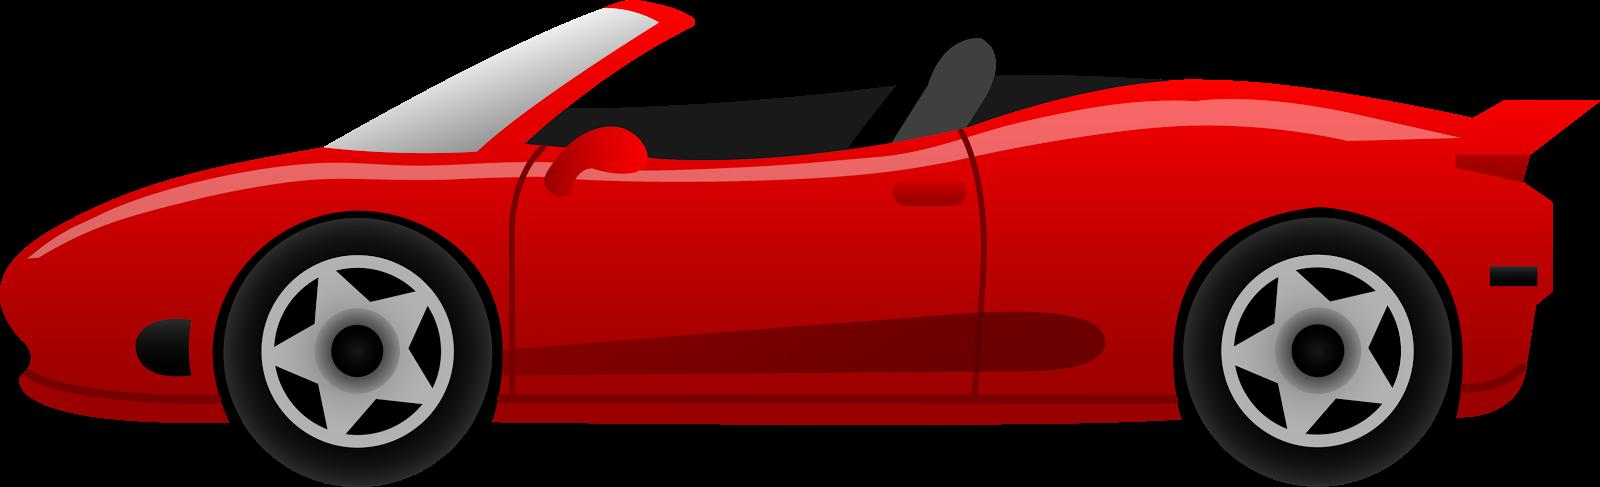 car clip art illustrations - photo #32